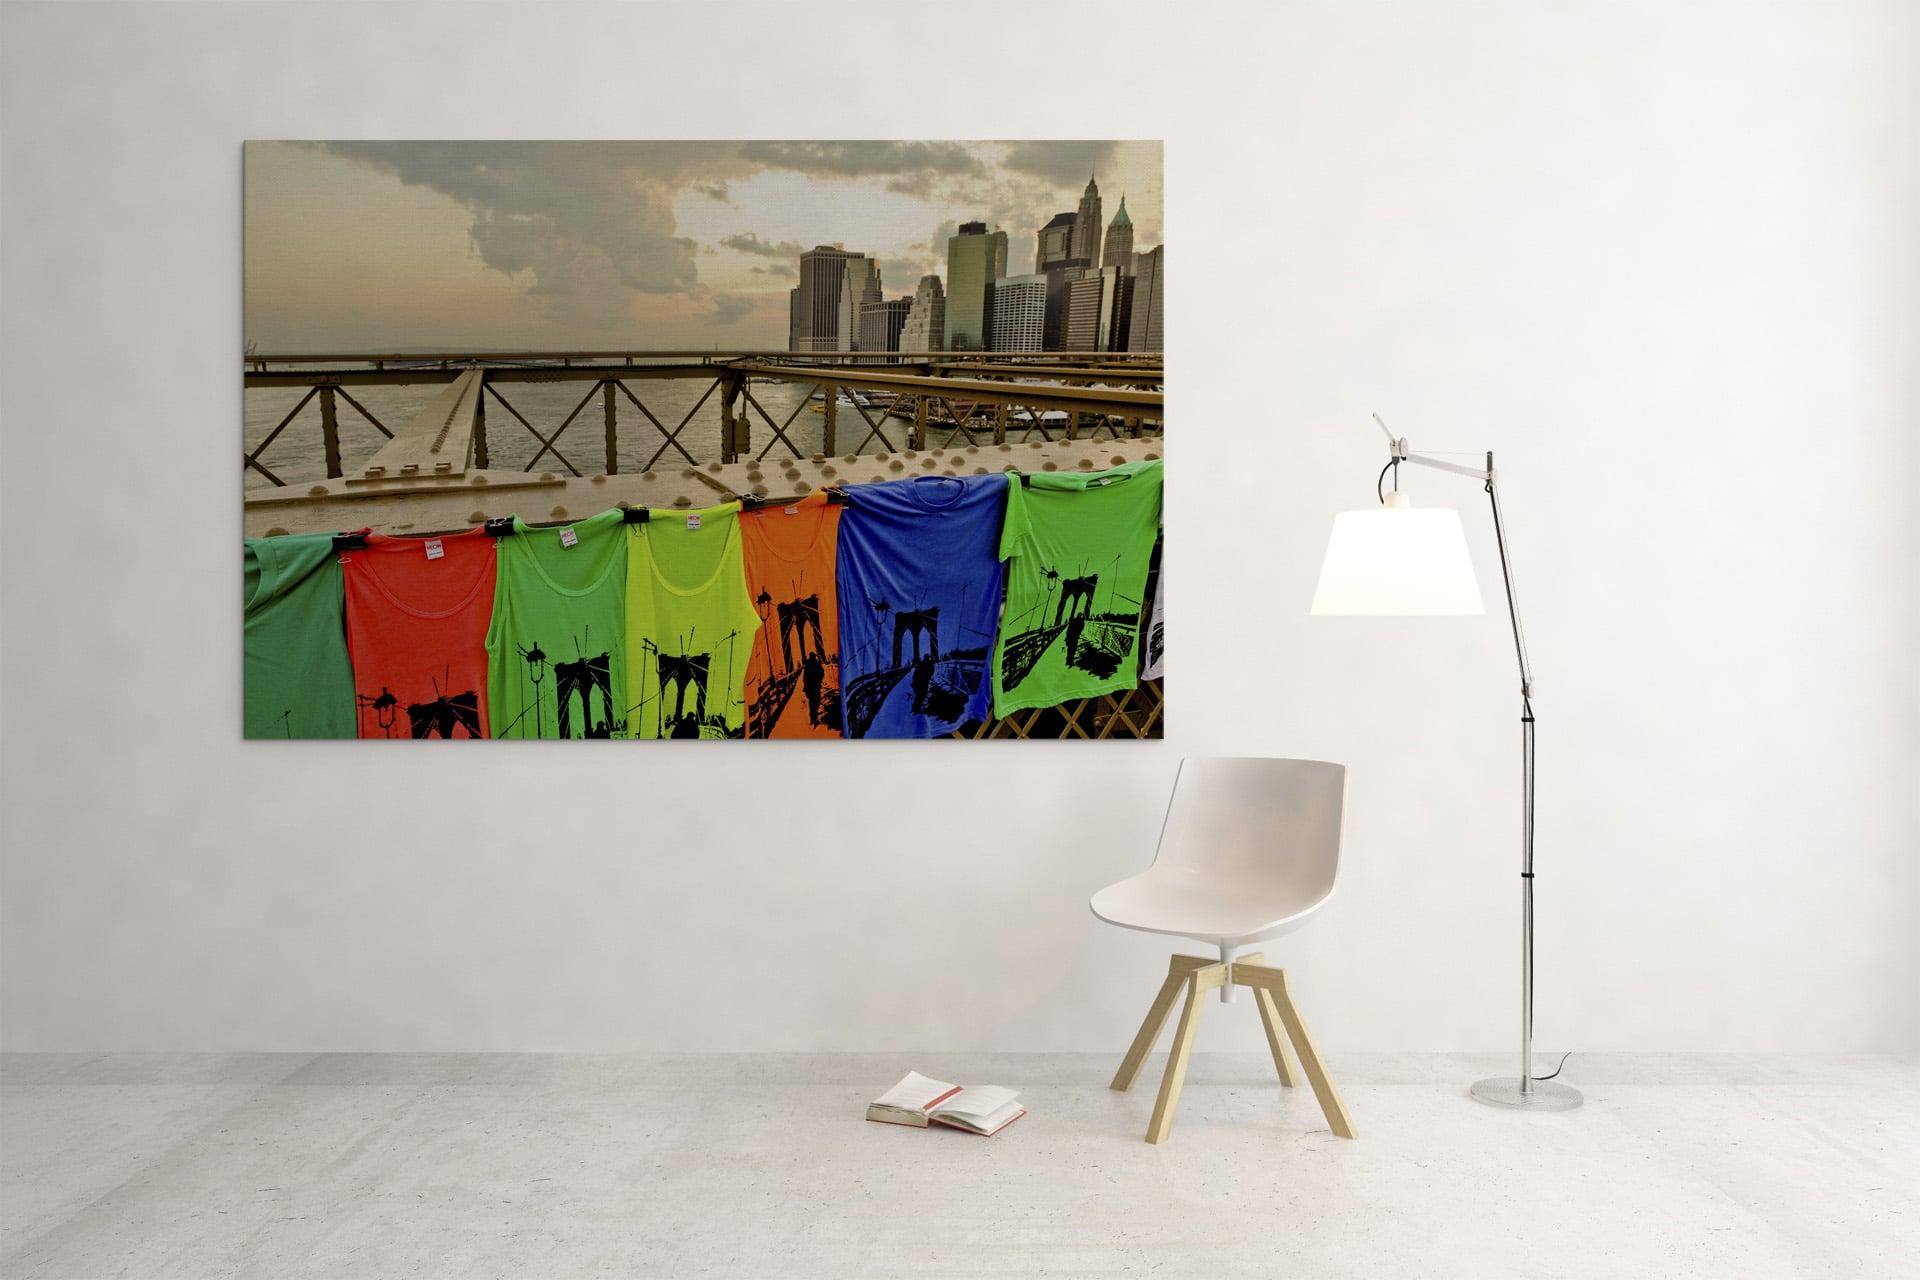 tableau-photo-new-york-picsmyhome-idée-deco-salon